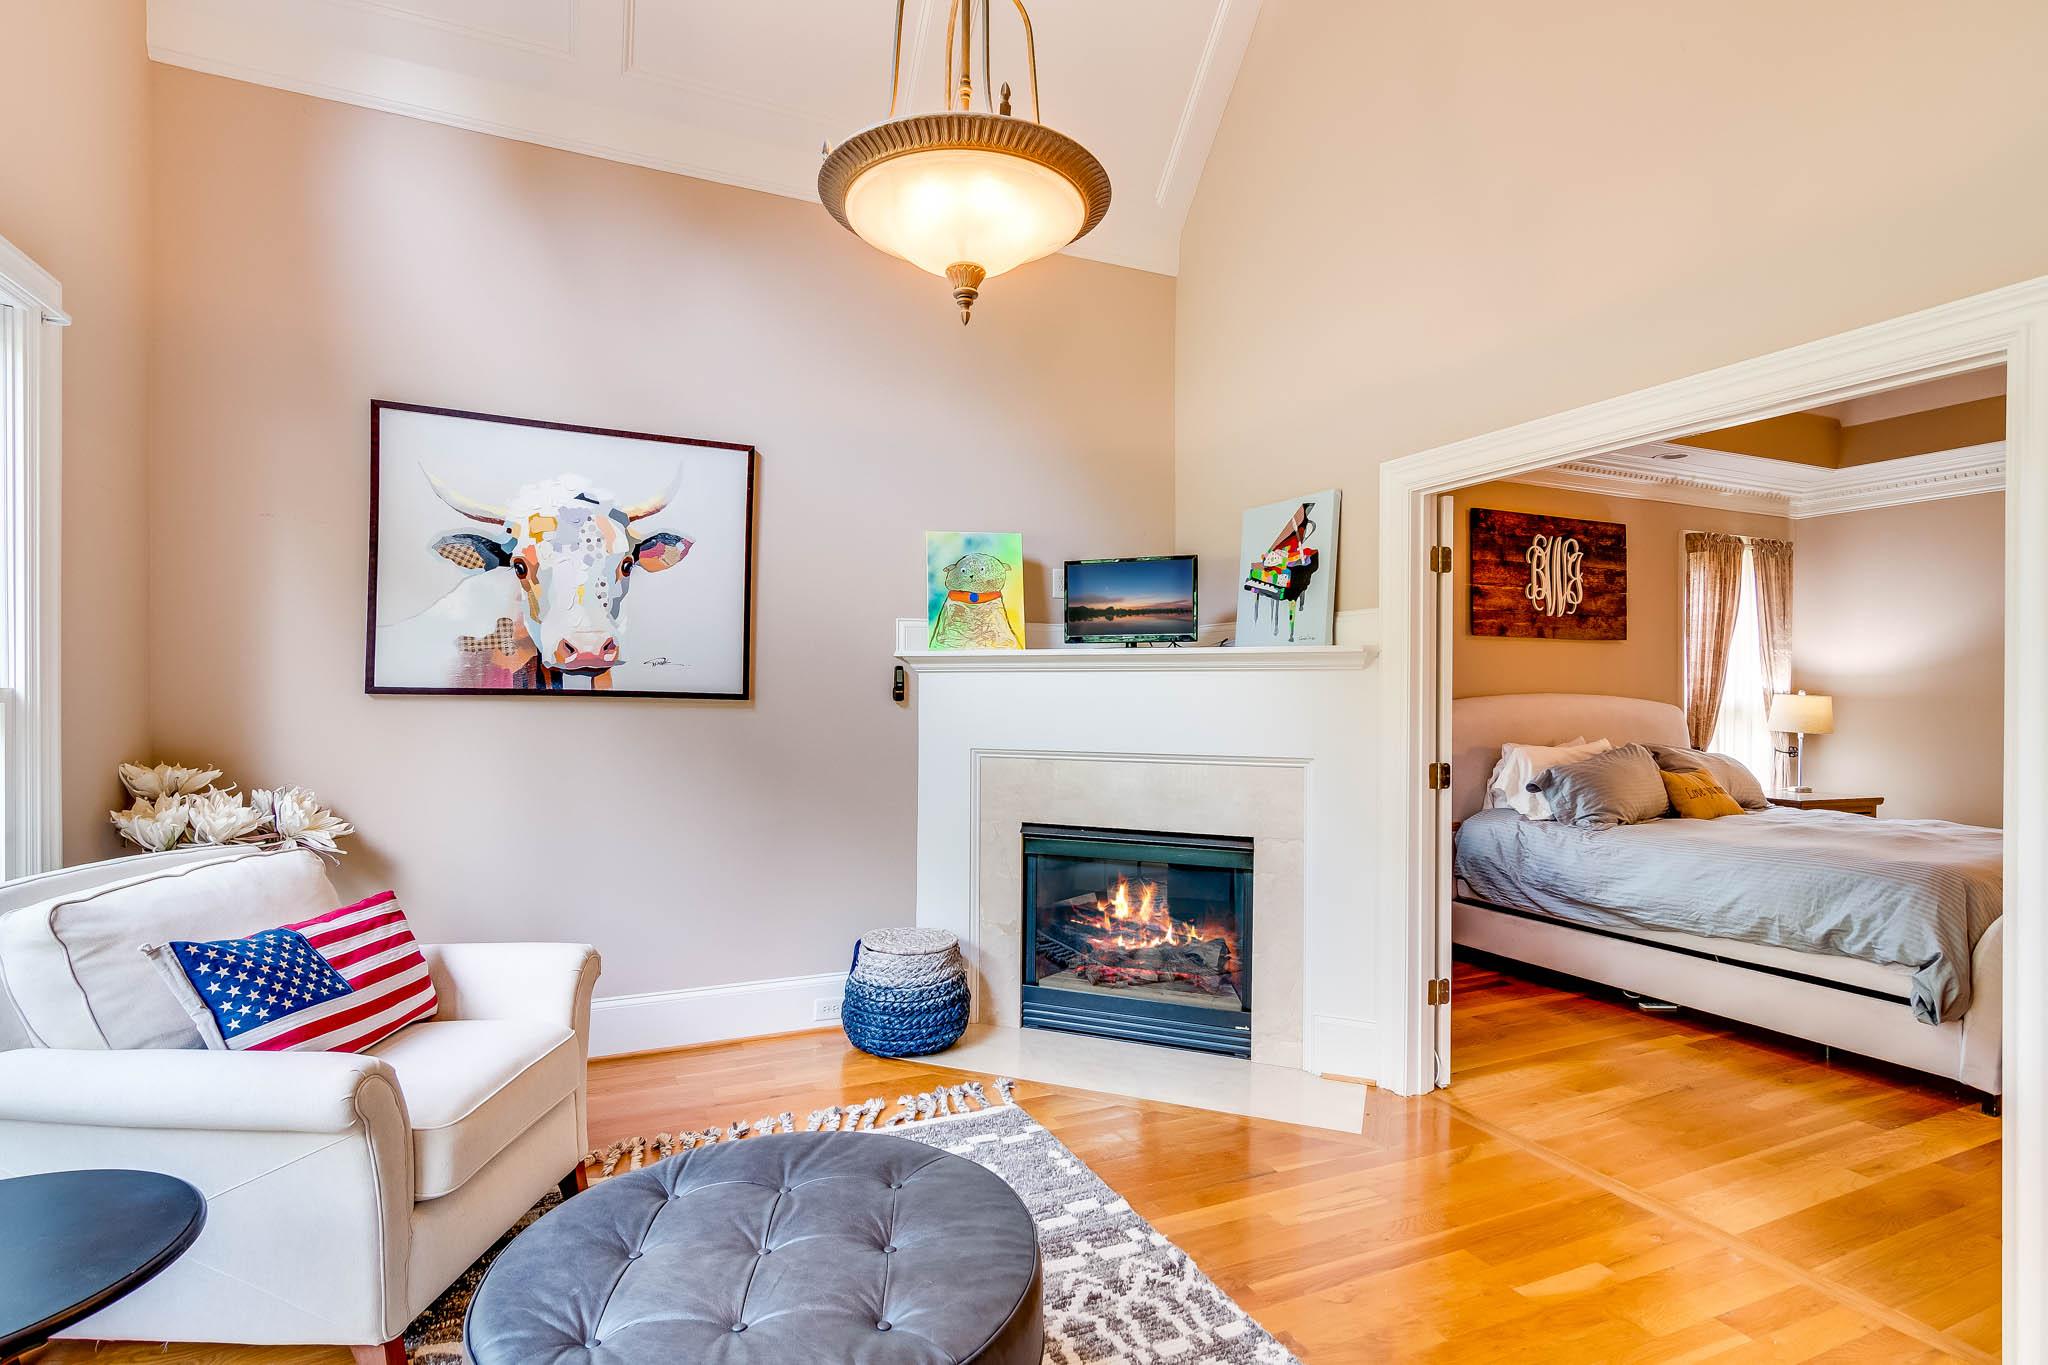 real_estate_photographer_living_room_photography-2.jpg